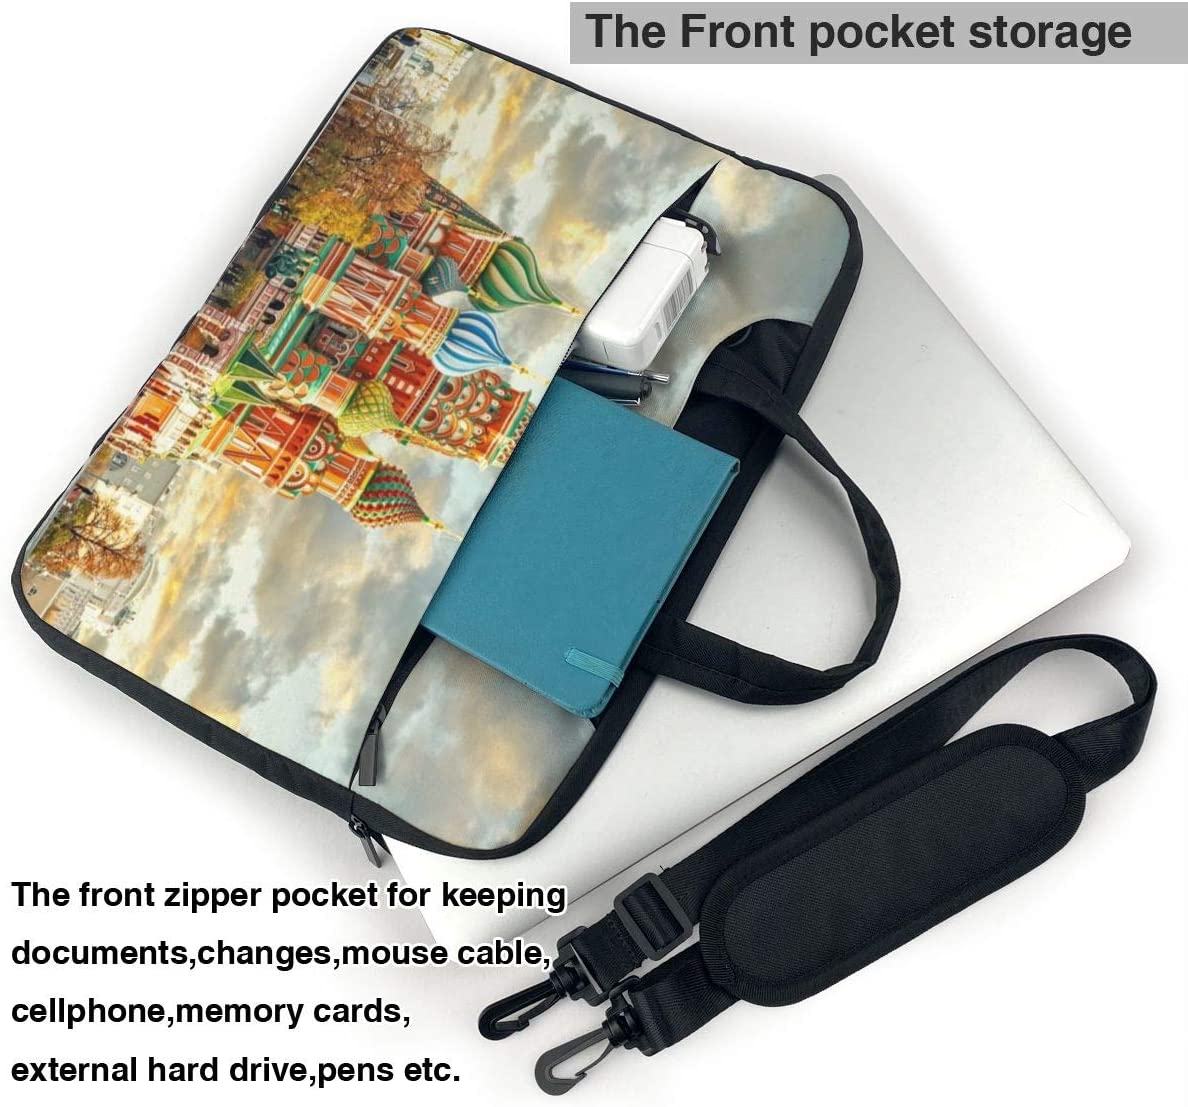 Red Square Moscow Portable Laptop Bag Business Laptop Shoulder Messenger Bag Protective Bag 15.6 Inch Yuotry Neoprene Laptop Sleeve Case